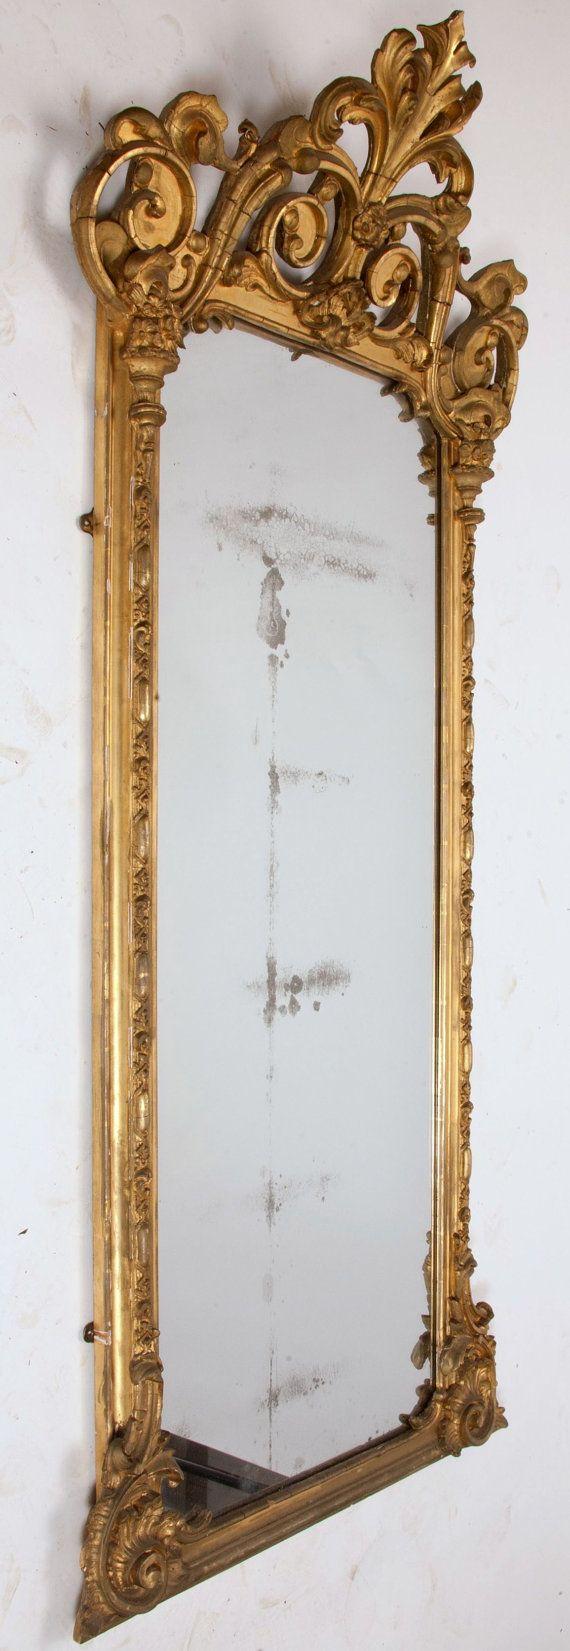 i wish !!!!!!! Circa 1870's Victorian Pier Mirror by trovedecor on Etsy, $38...